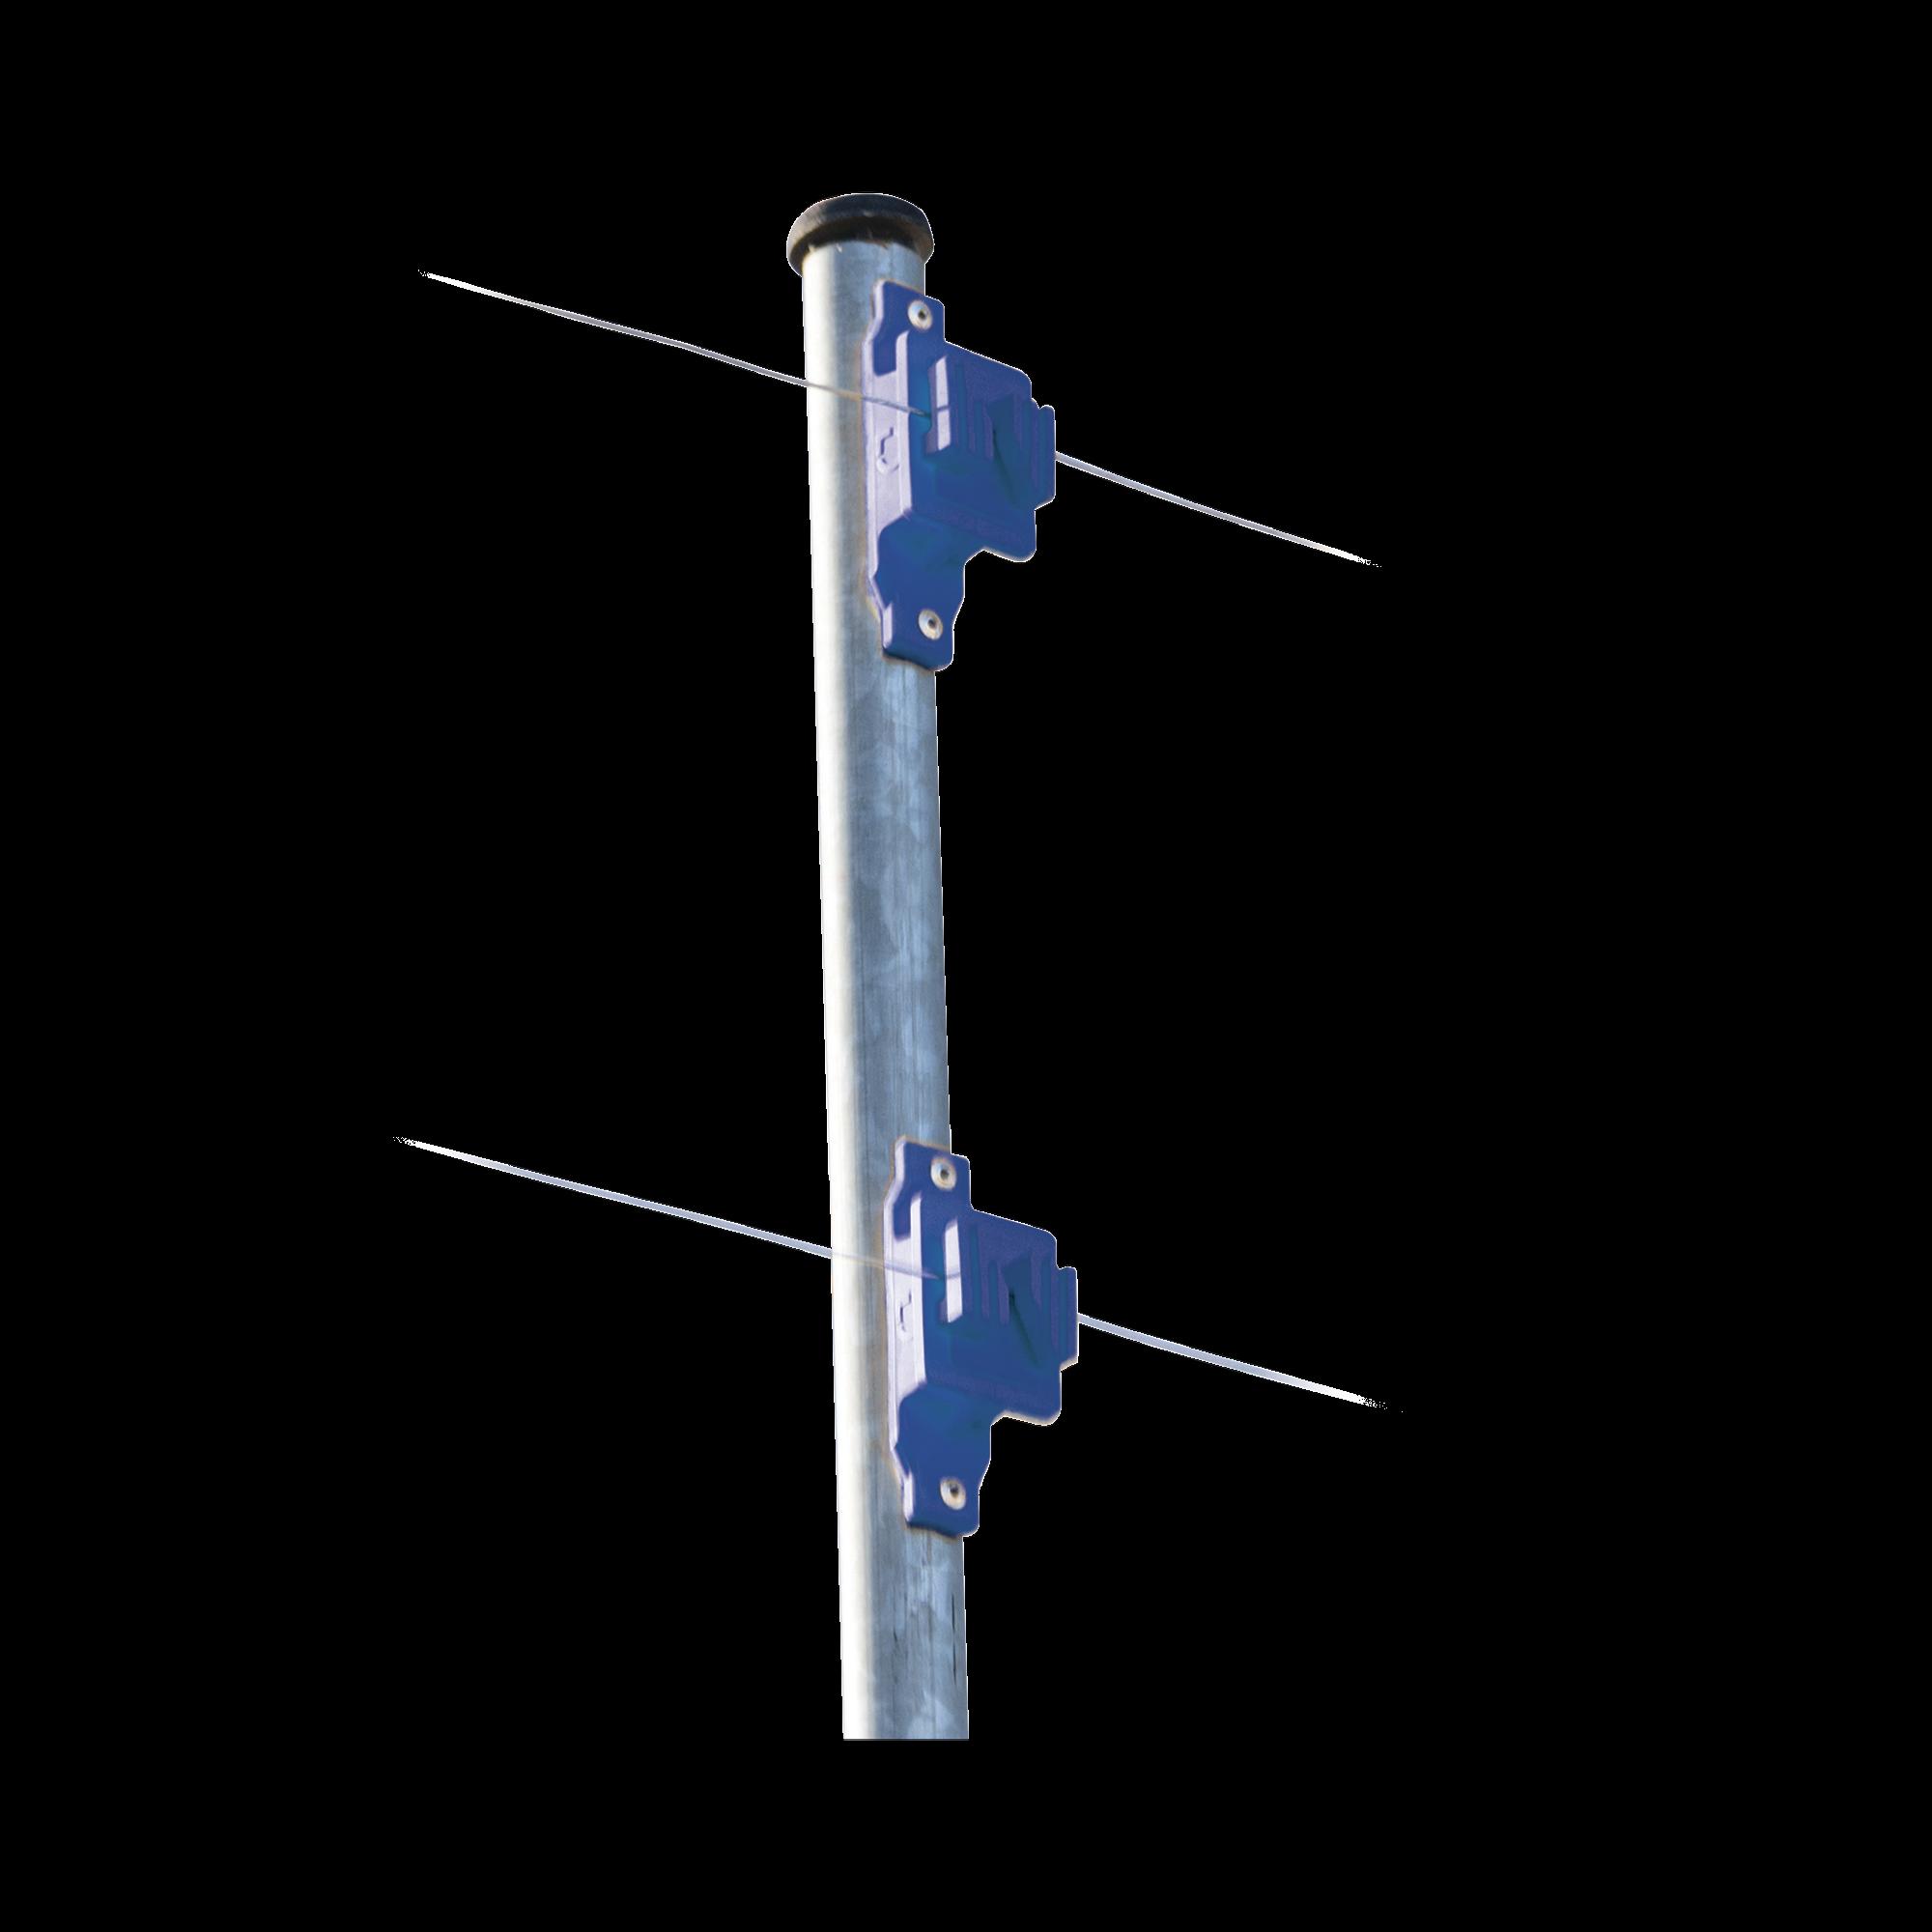 Aislador de Paso colo Azul reforzado para cercos eléctricos, resistente al clima extremoso